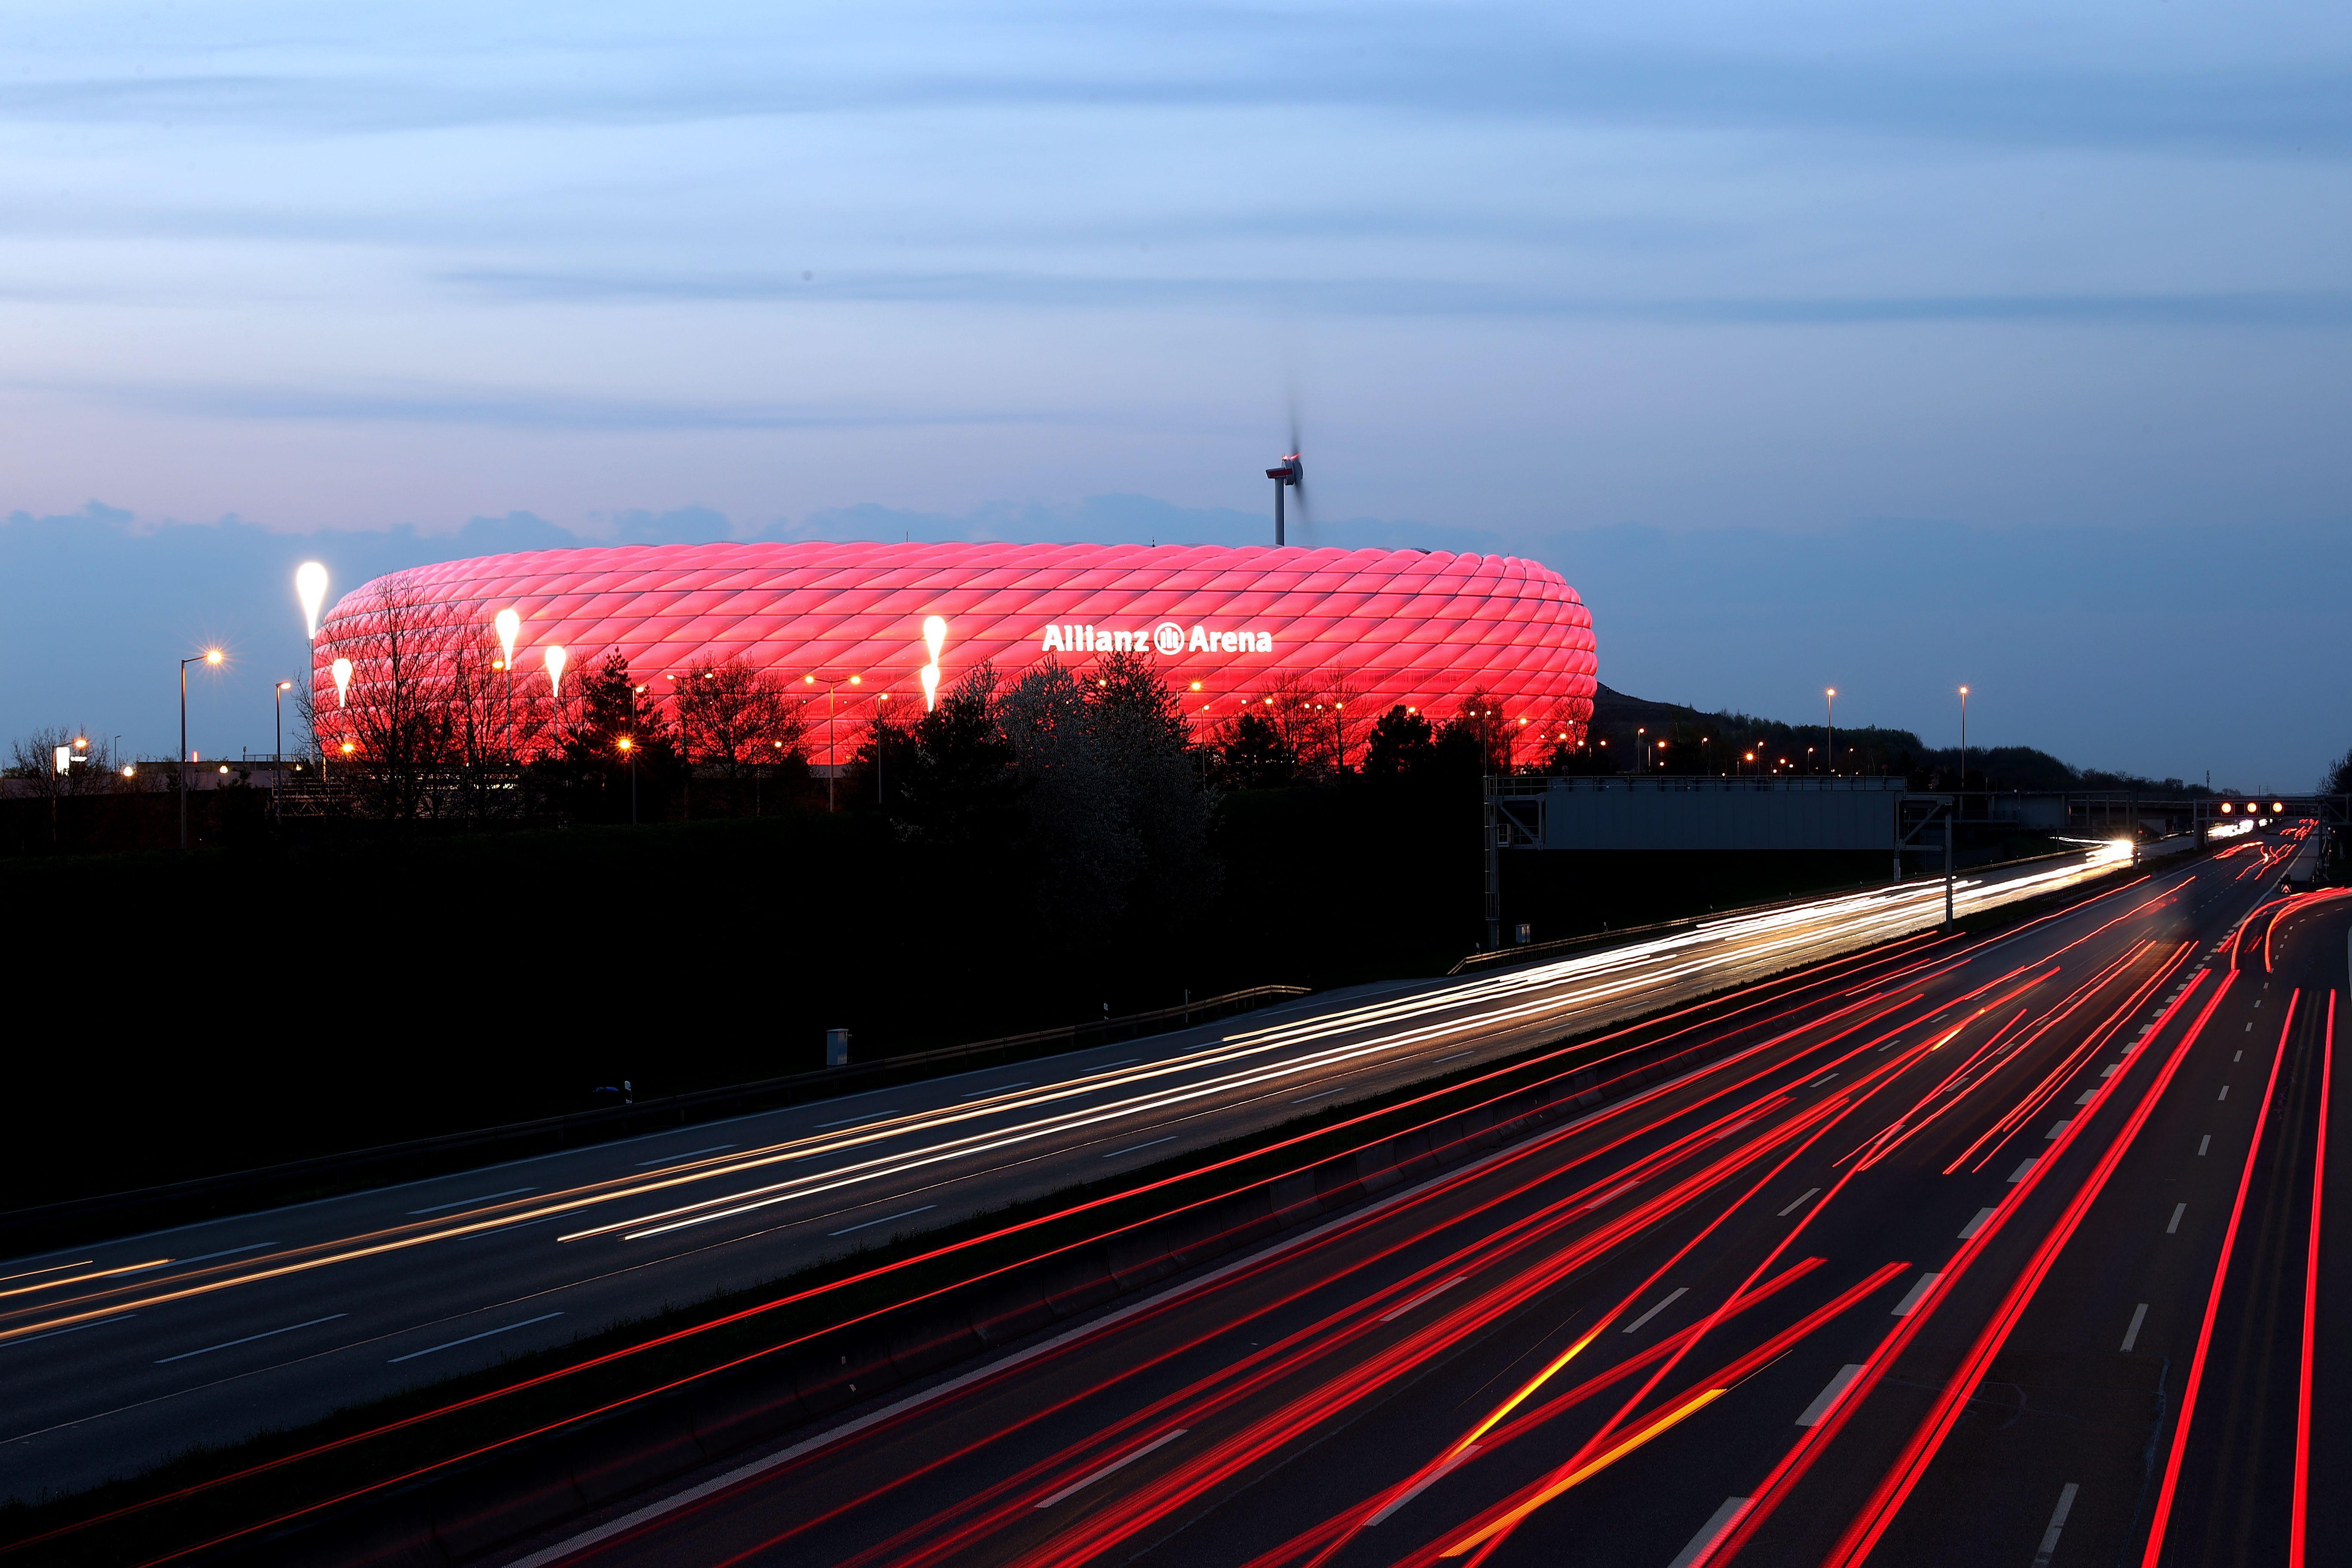 Monaco - Football Arena Munich